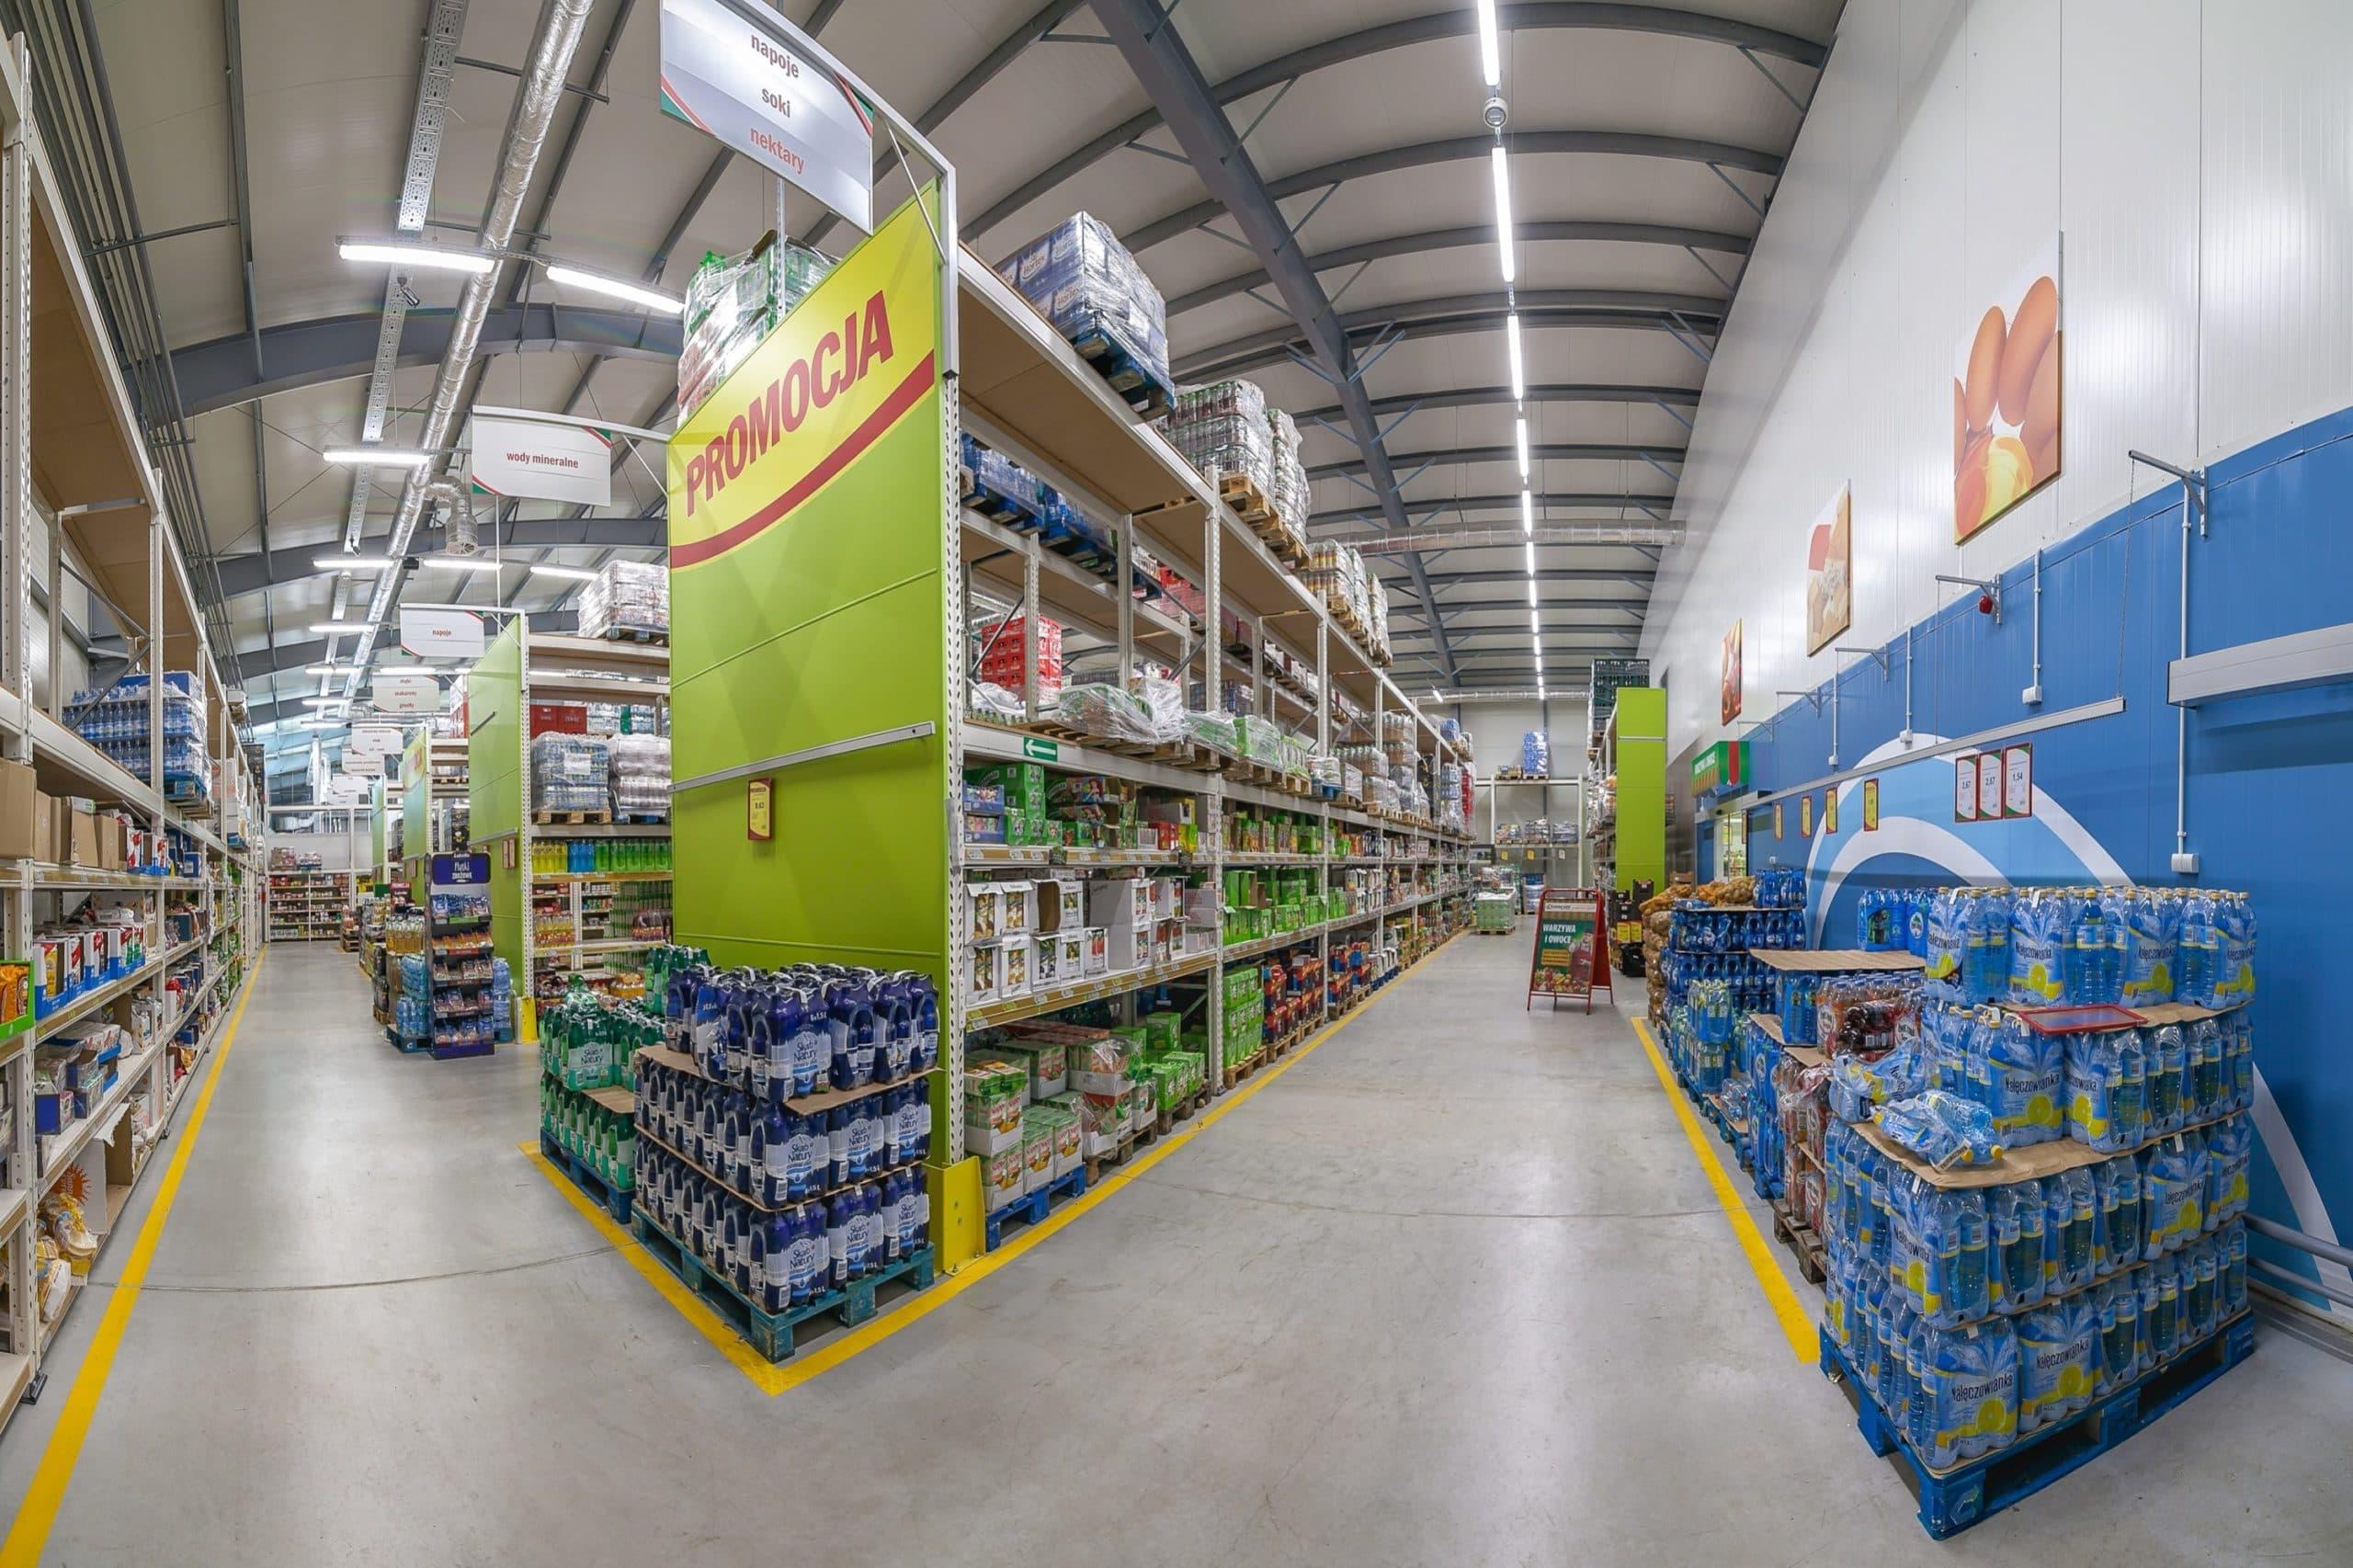 oprawy Industrial w markecie Eurocash - Luxon LED